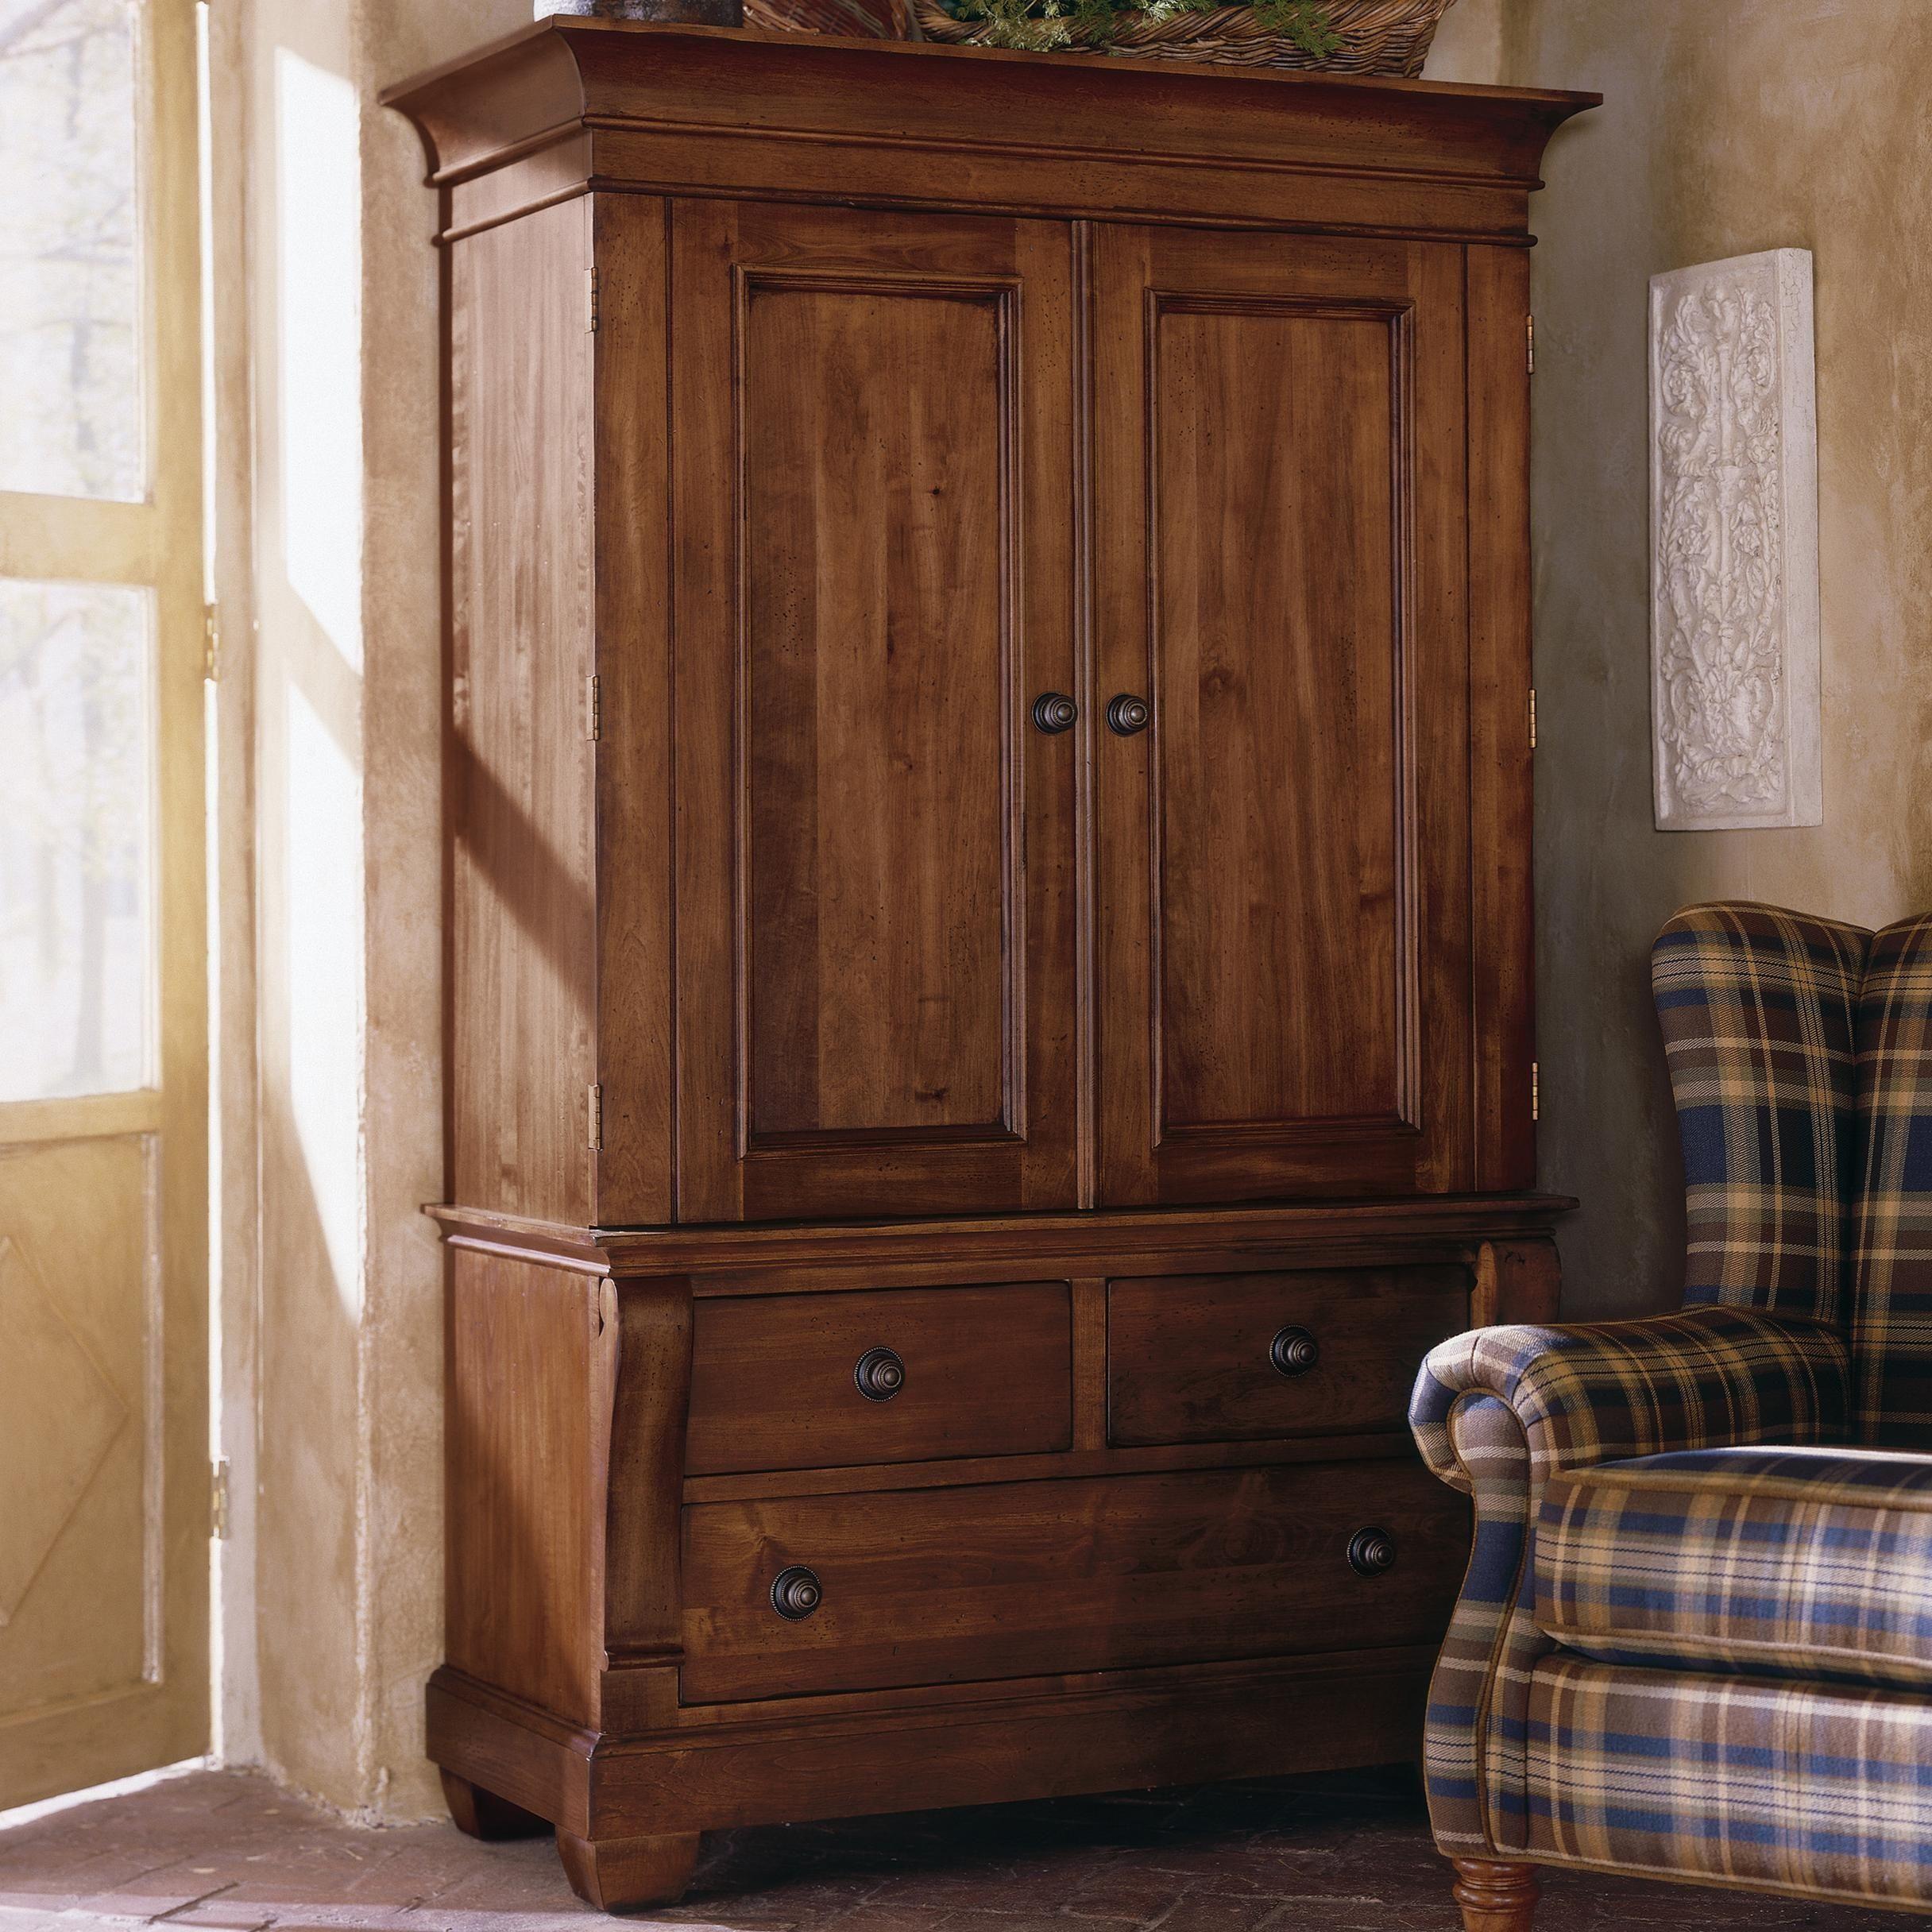 Wood Tv Cabinet With Doors